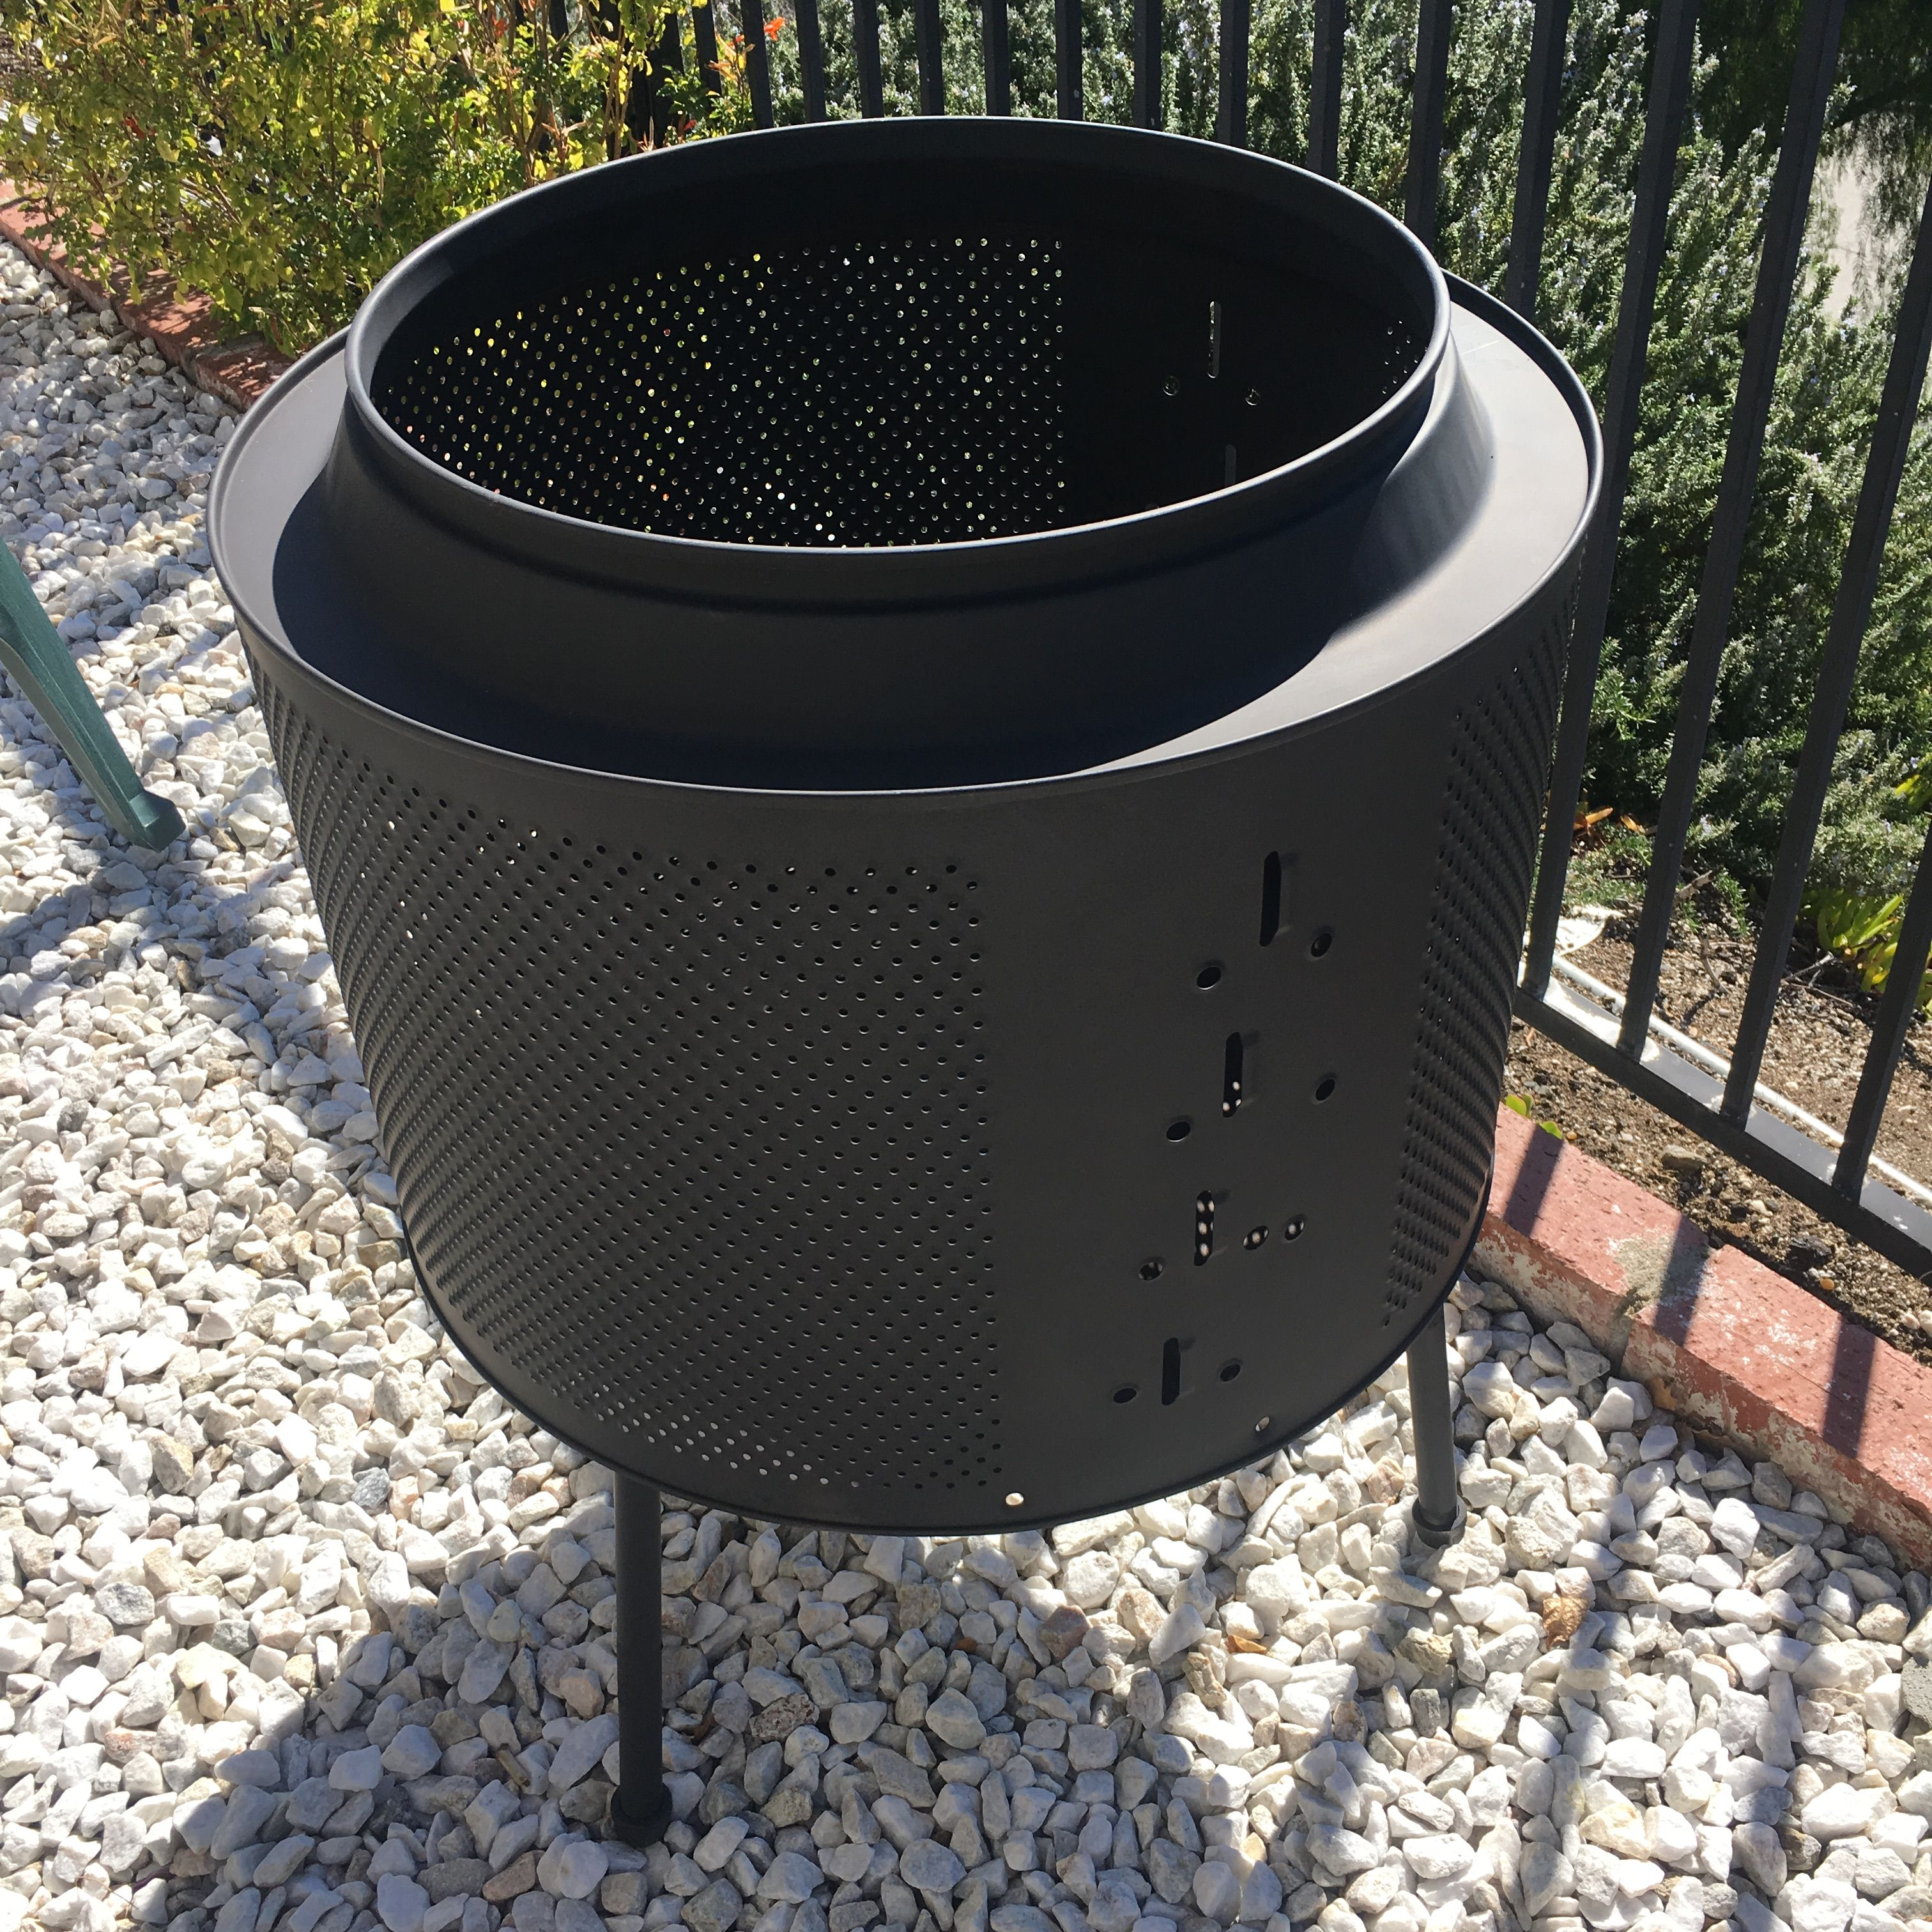 Dryer Drum Fire Pit In 2019 Diy Fire Pit Fire Diy